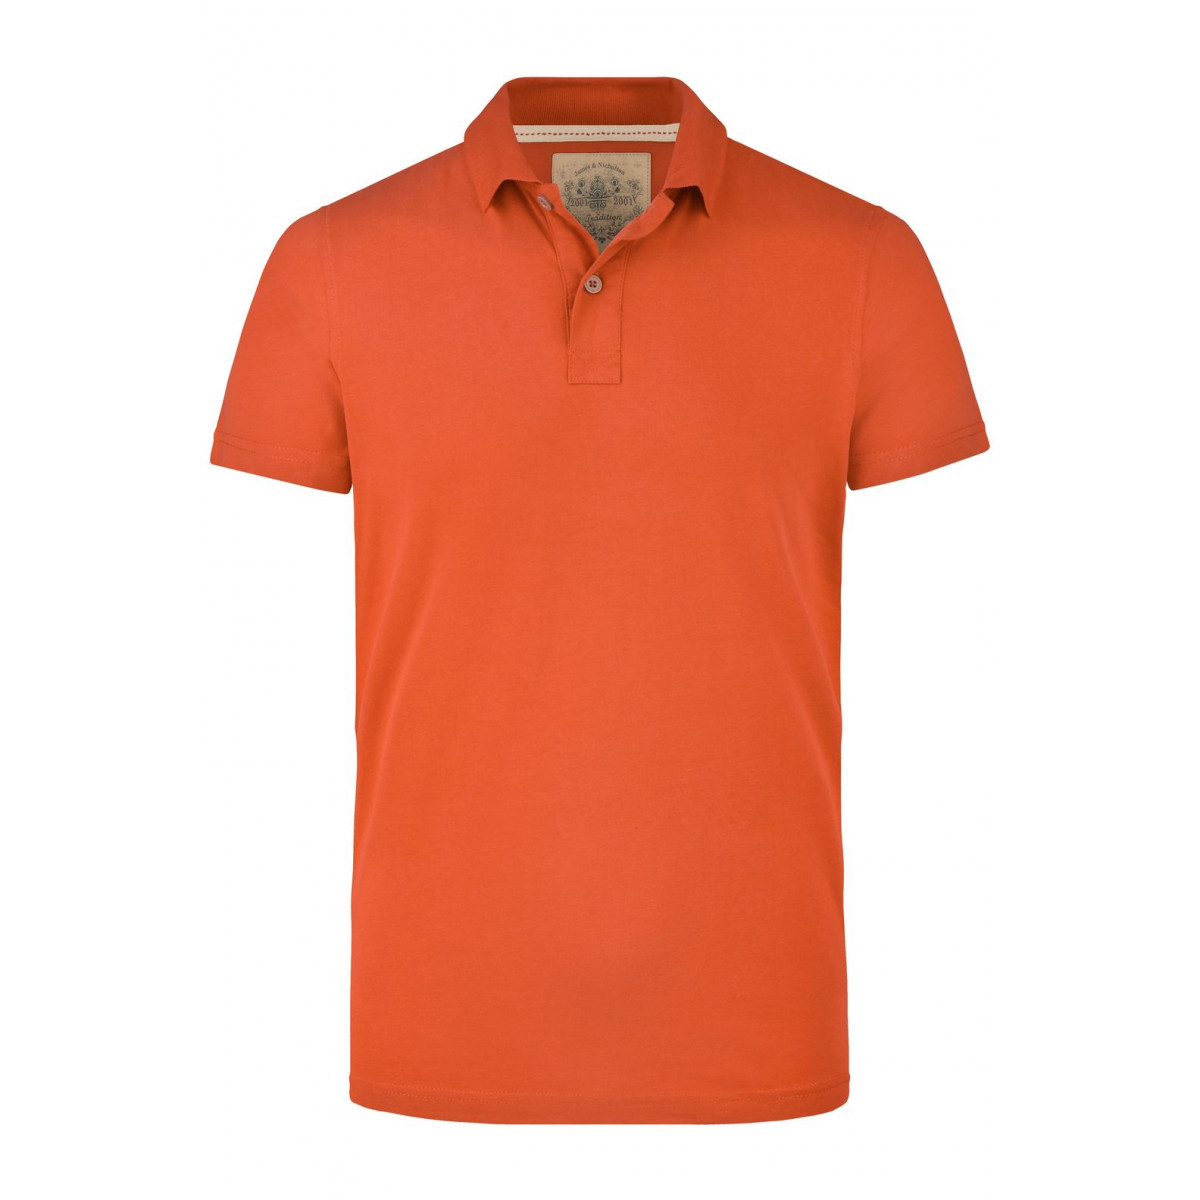 Рубашка поло мужская JN941 Mens Vintage Polo - Темно-оранжевый